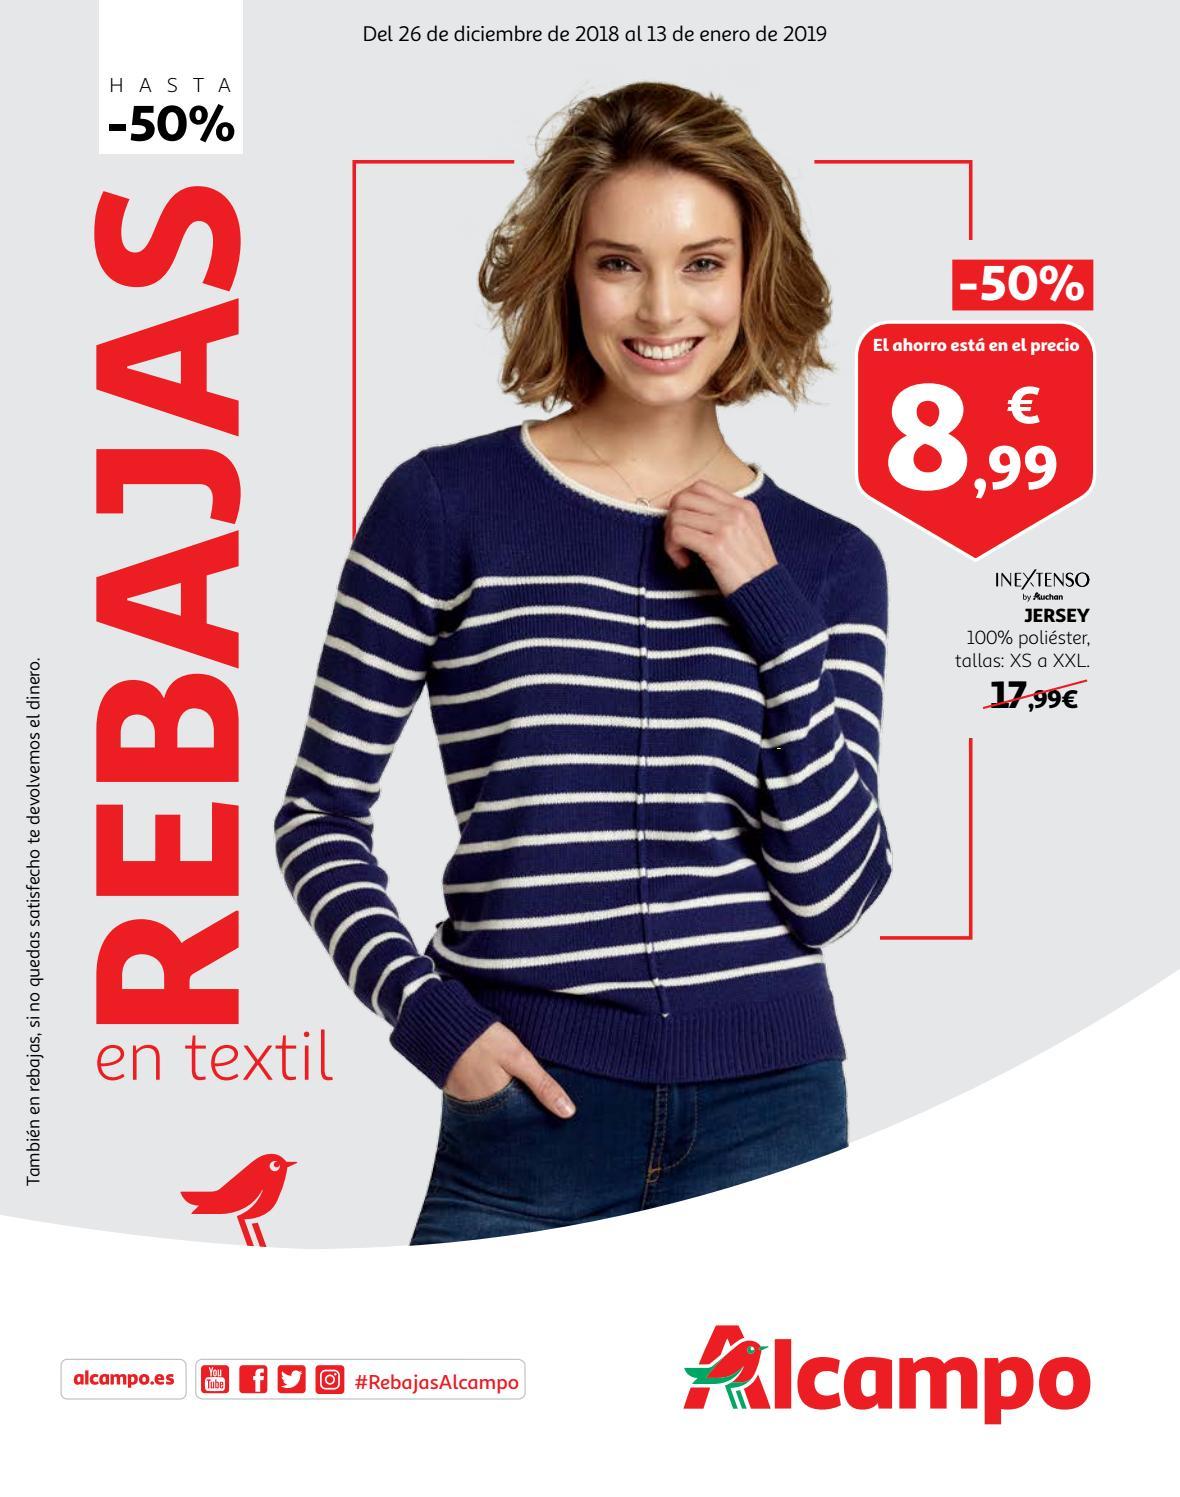 Alcampo Rebajas Textil Supermercados By Issuu Catálogo En Ofertas Fz4qz